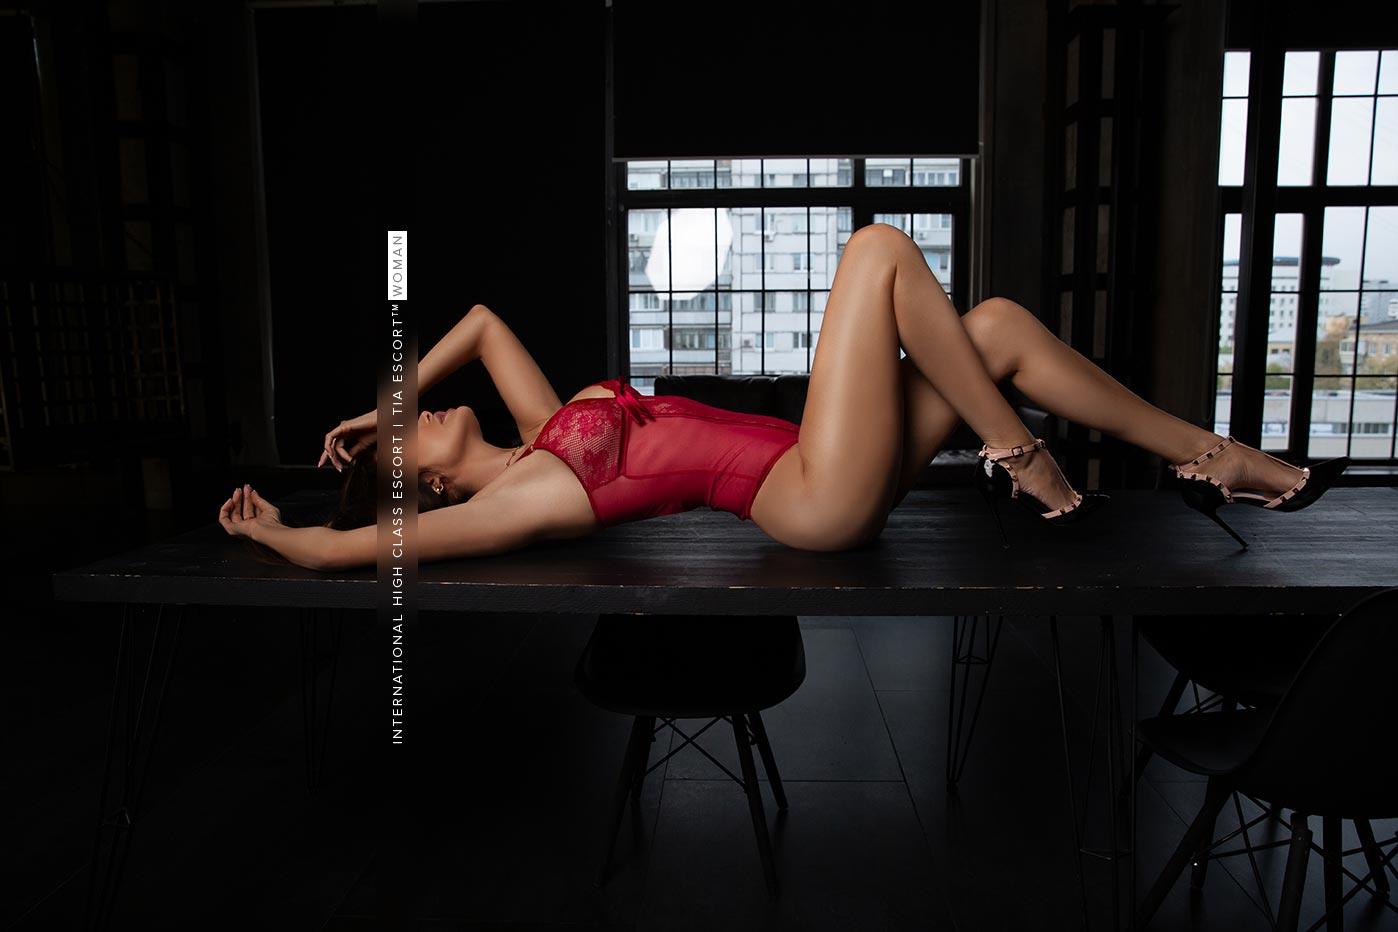 Girlfriend Erotik Berlin - Coco 15